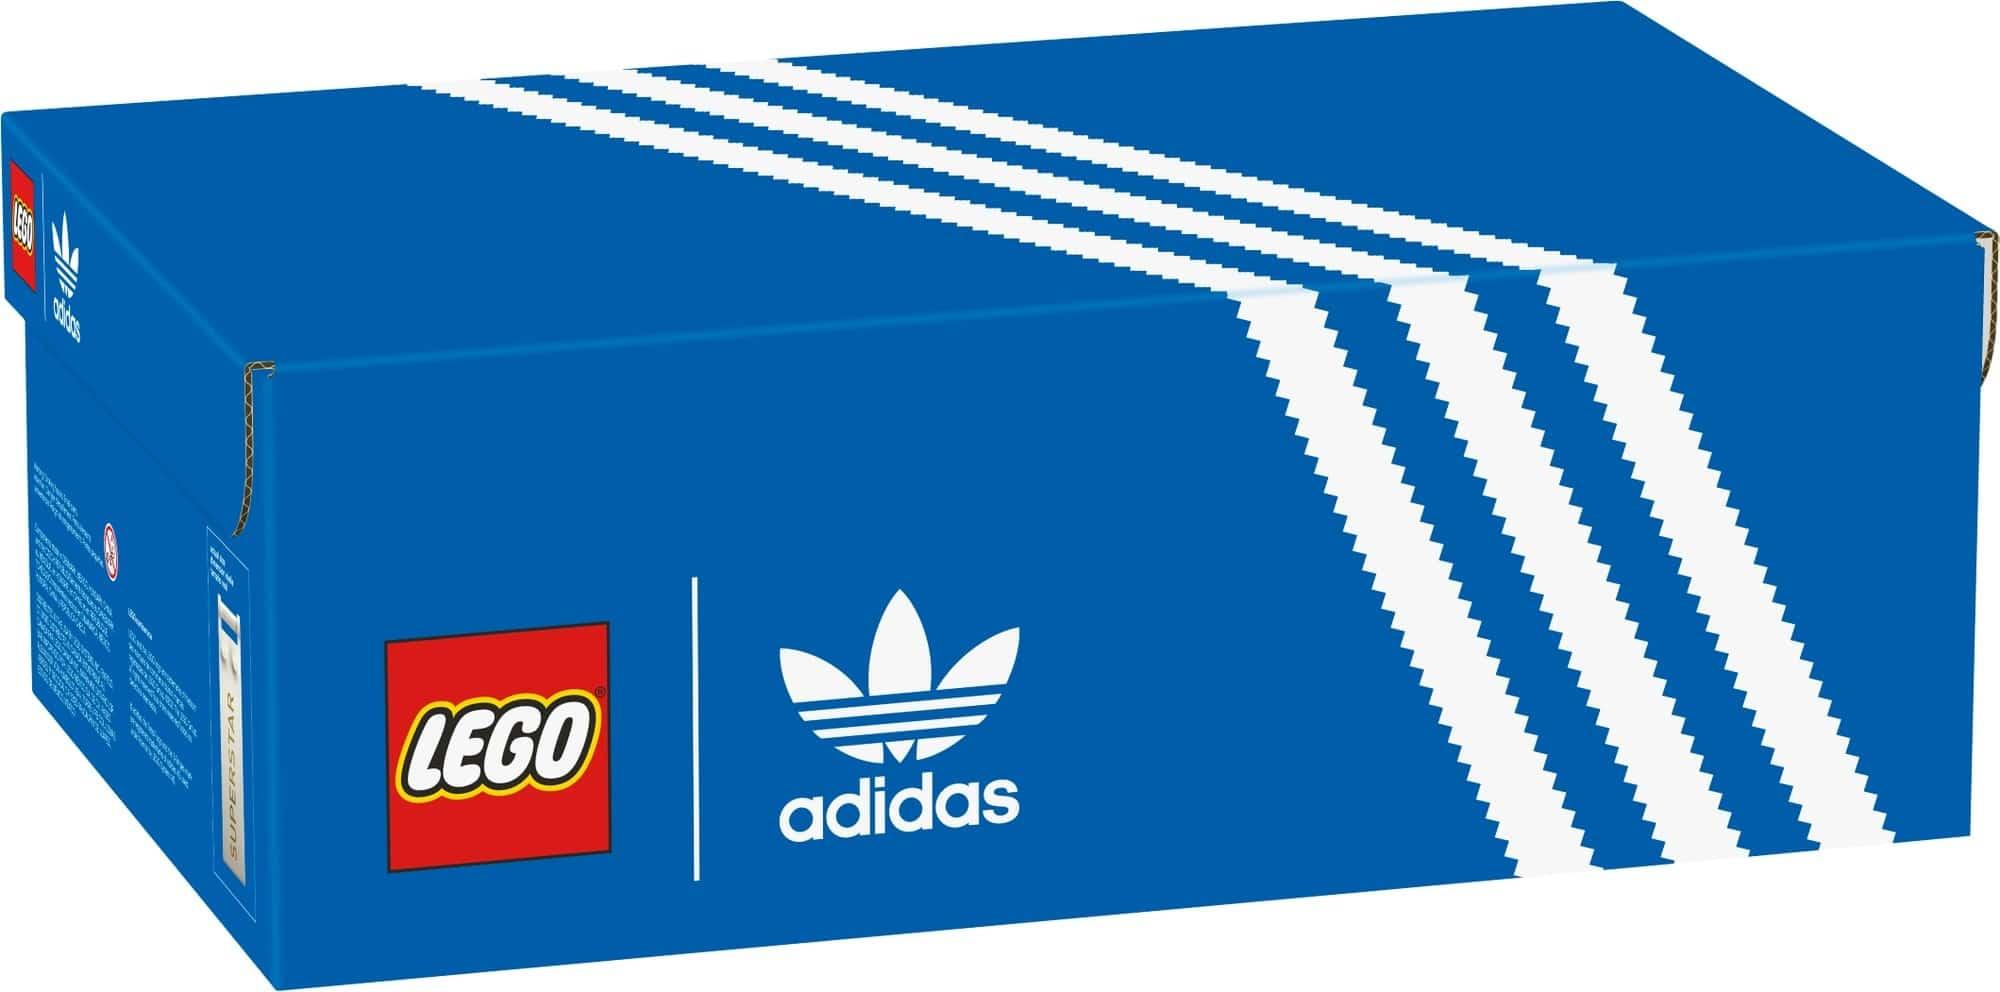 LEGO 10282 Adidas Originals Superstar 9